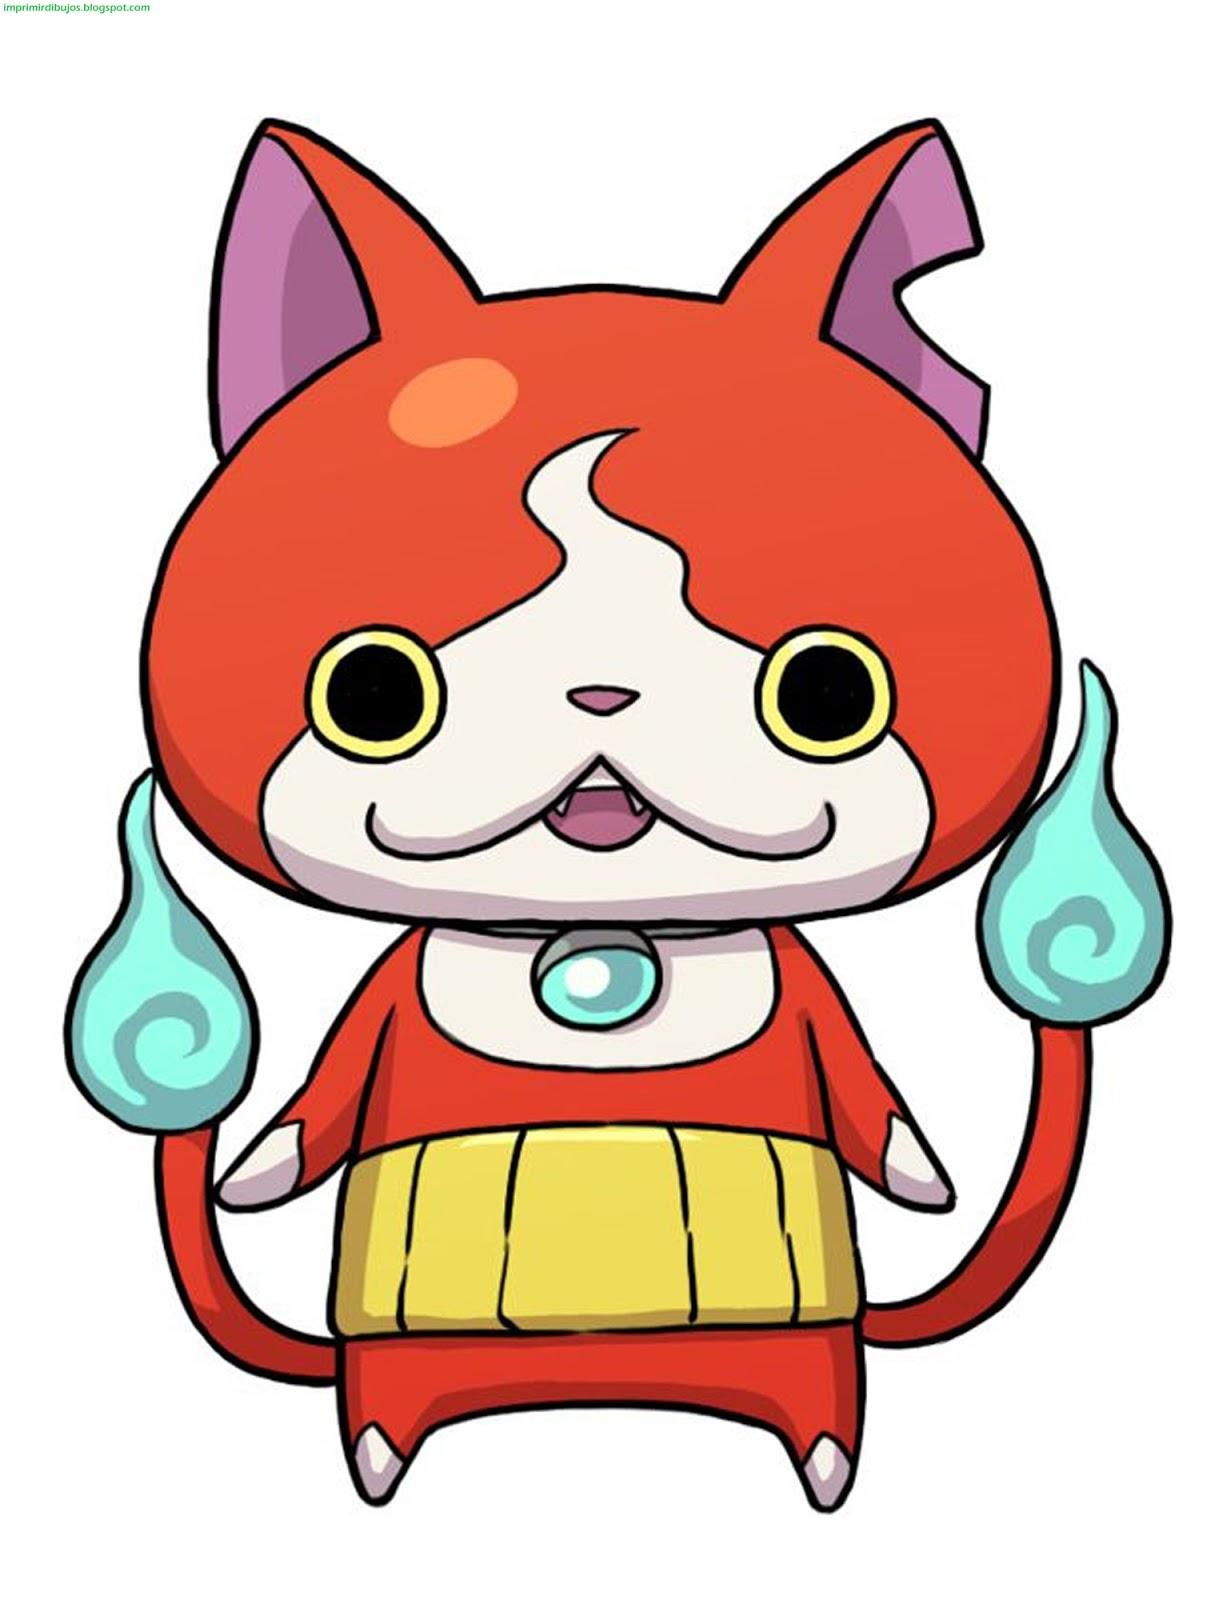 Imprimir Dibujos: Dibujos de personajes de Yo-Kai Watch para ...